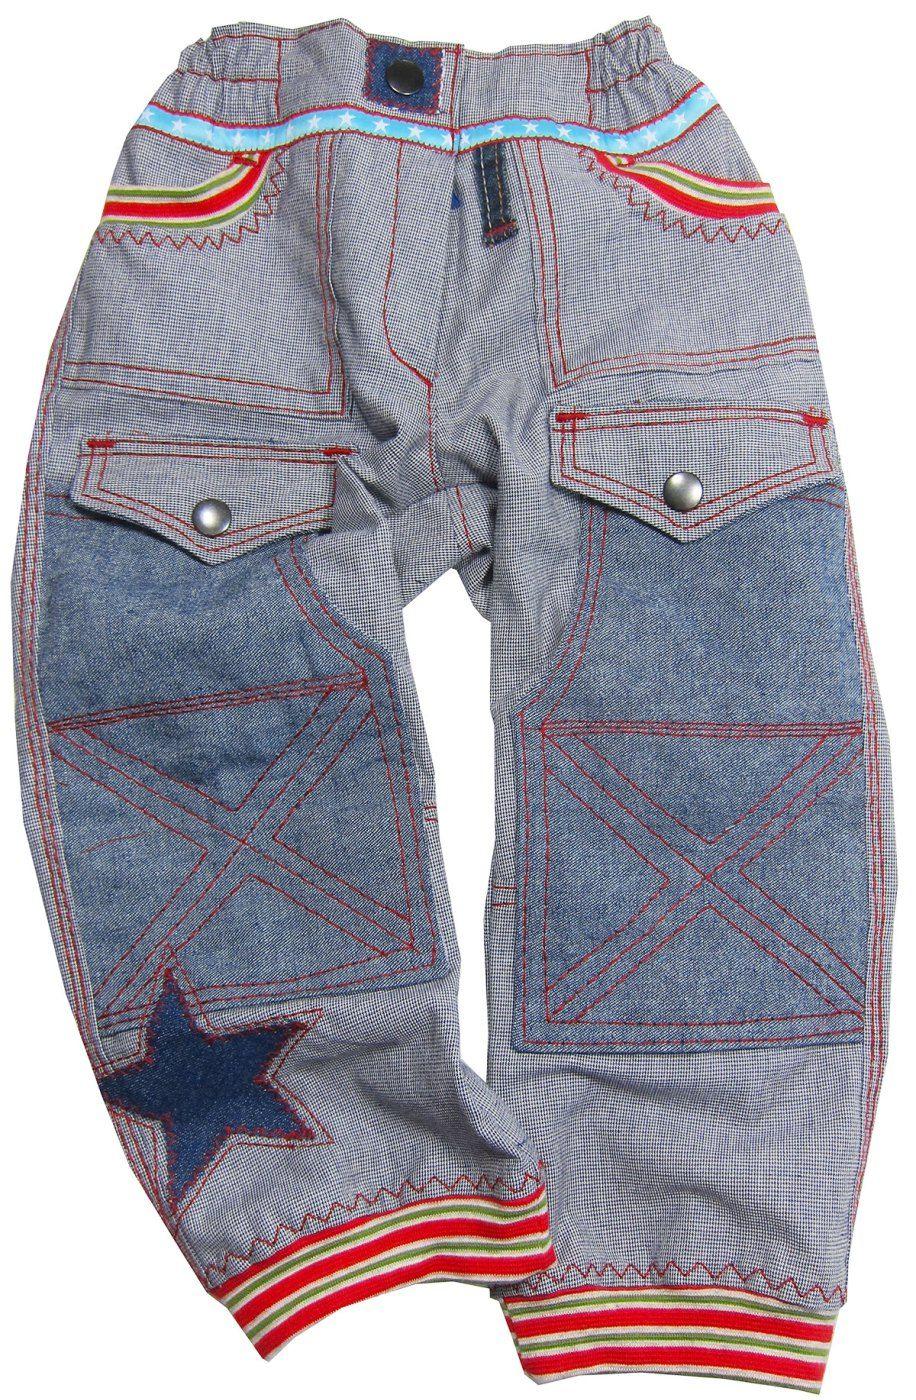 schnittmuster coole jeanshose jungs maedchen bo farbenmix de farbenmix kinder pinterest. Black Bedroom Furniture Sets. Home Design Ideas